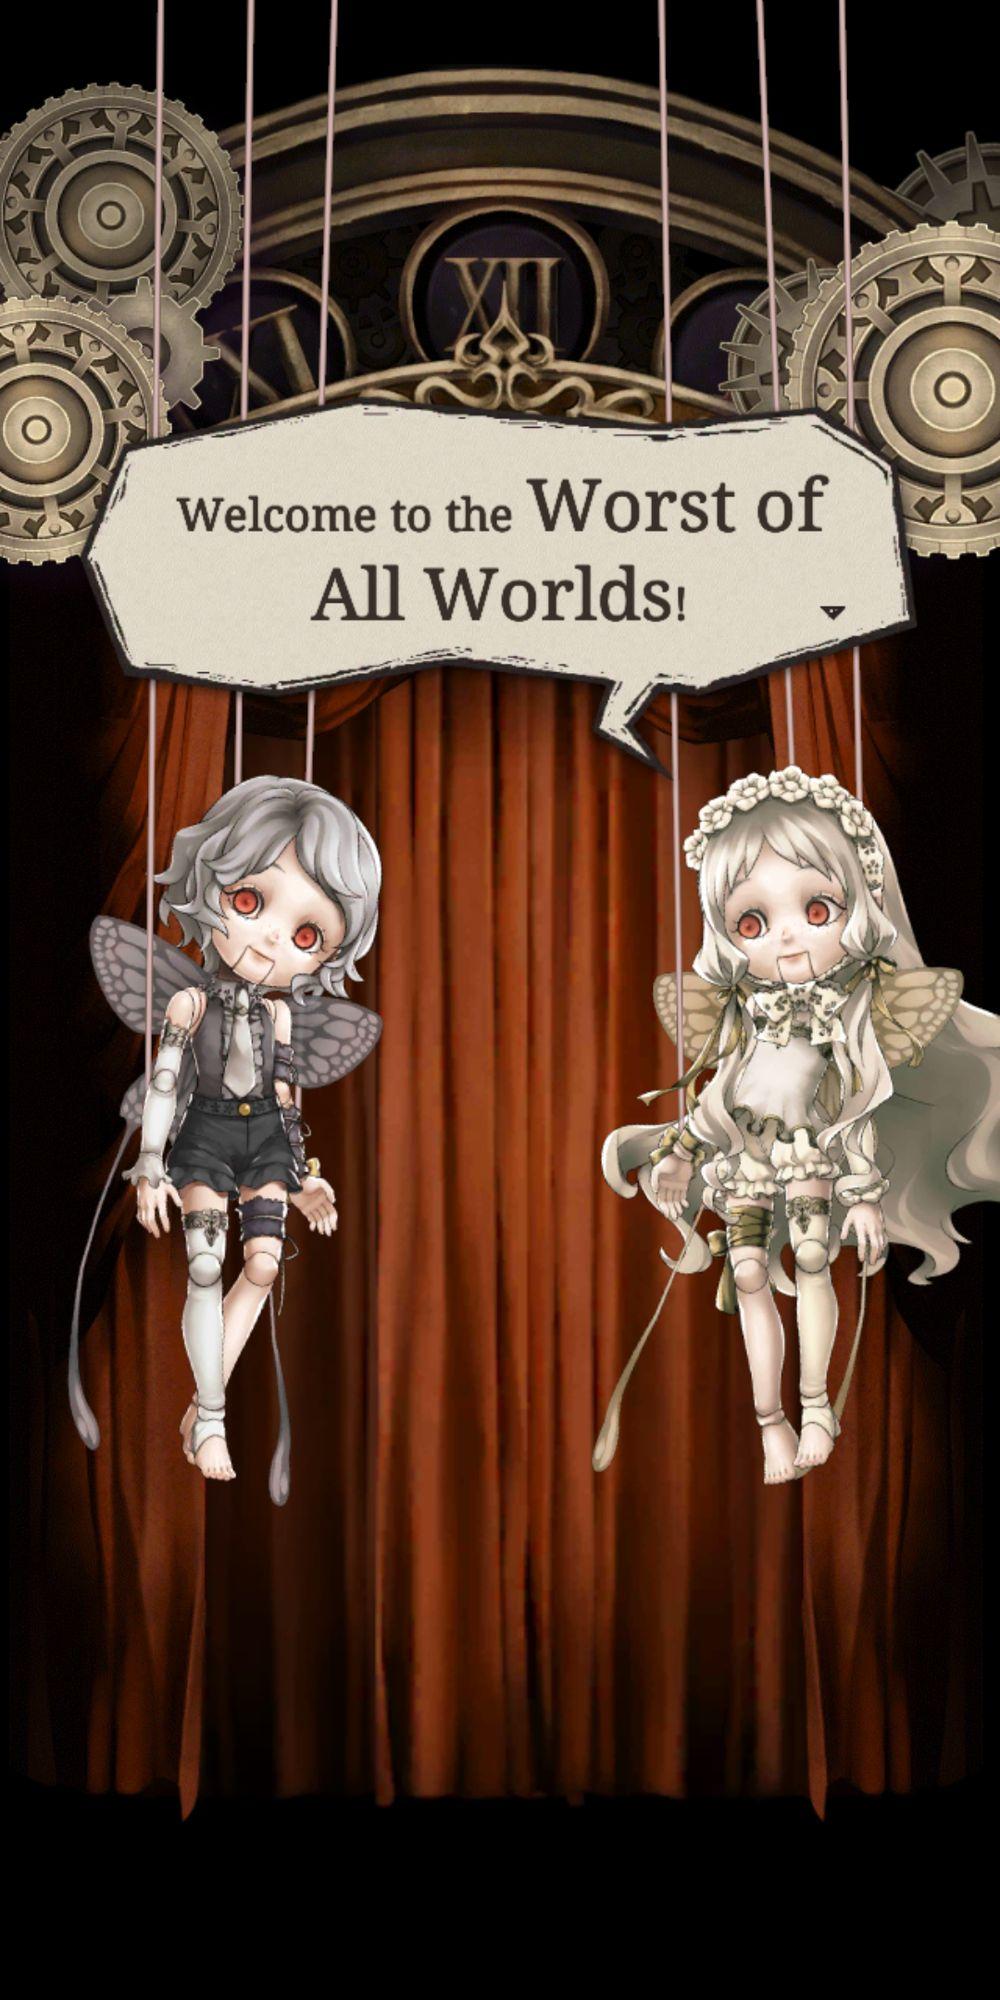 Parrah e Noya, le inquietanti marionette guardiane della Library